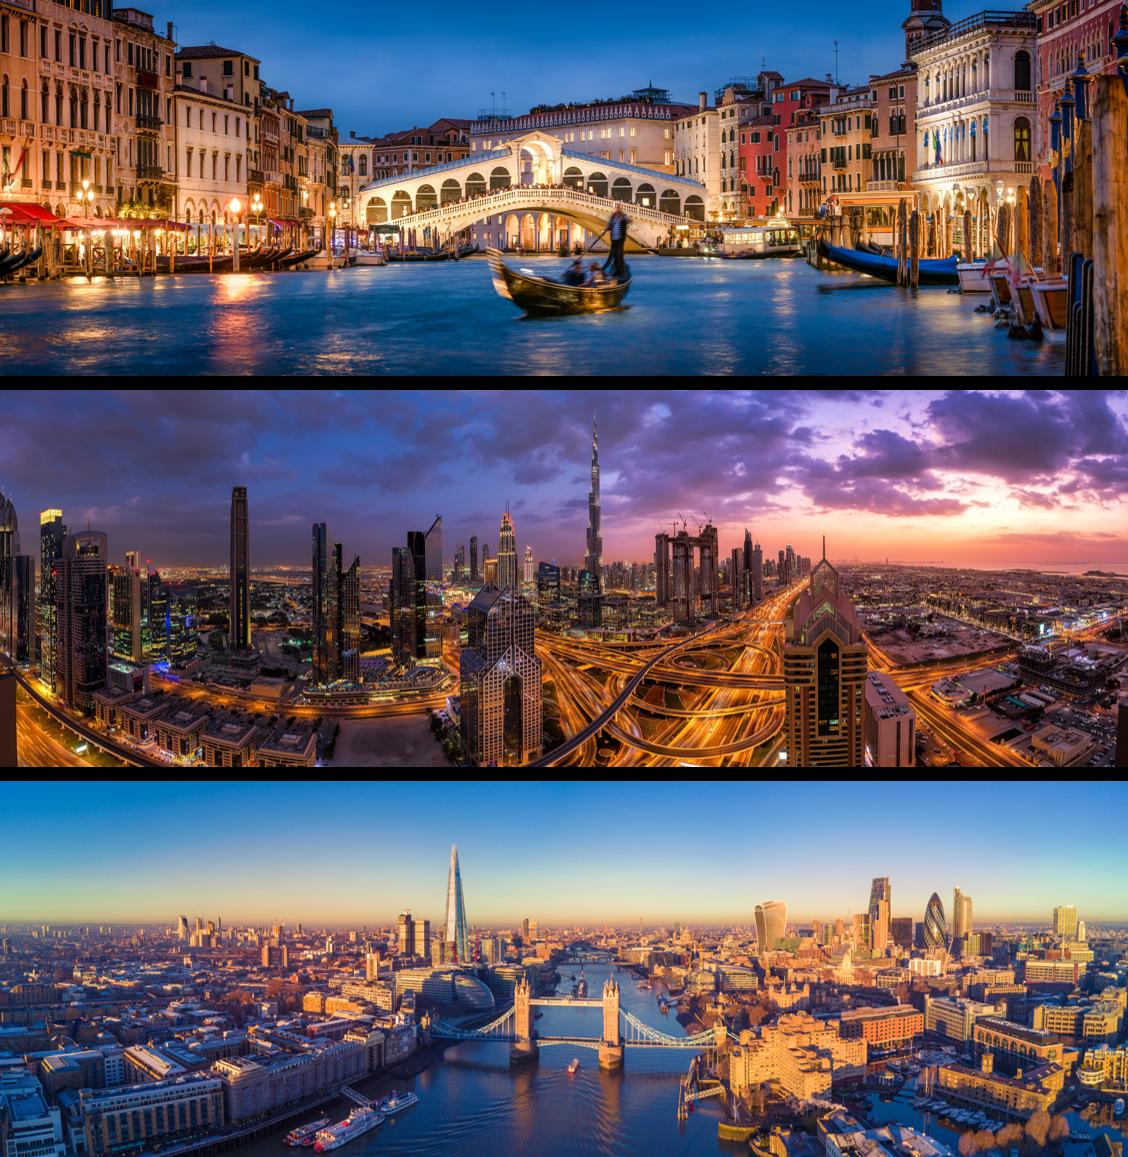 GRS Venice-Dubai-London